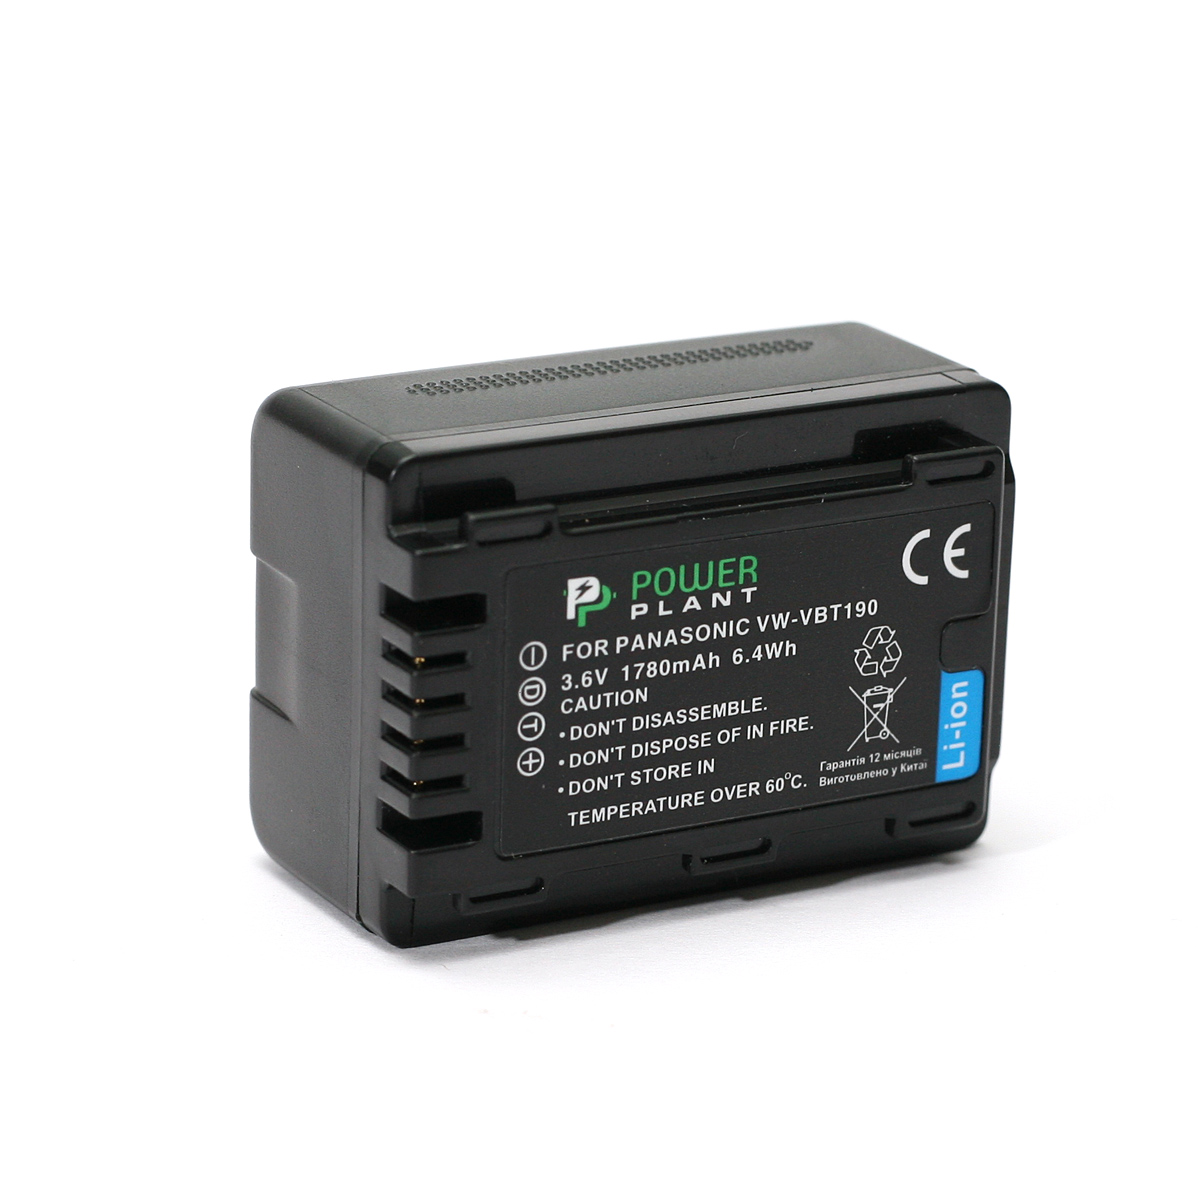 Купить Аккумулятор PowerPlant Panasonic VW-VBT190 1780mAh